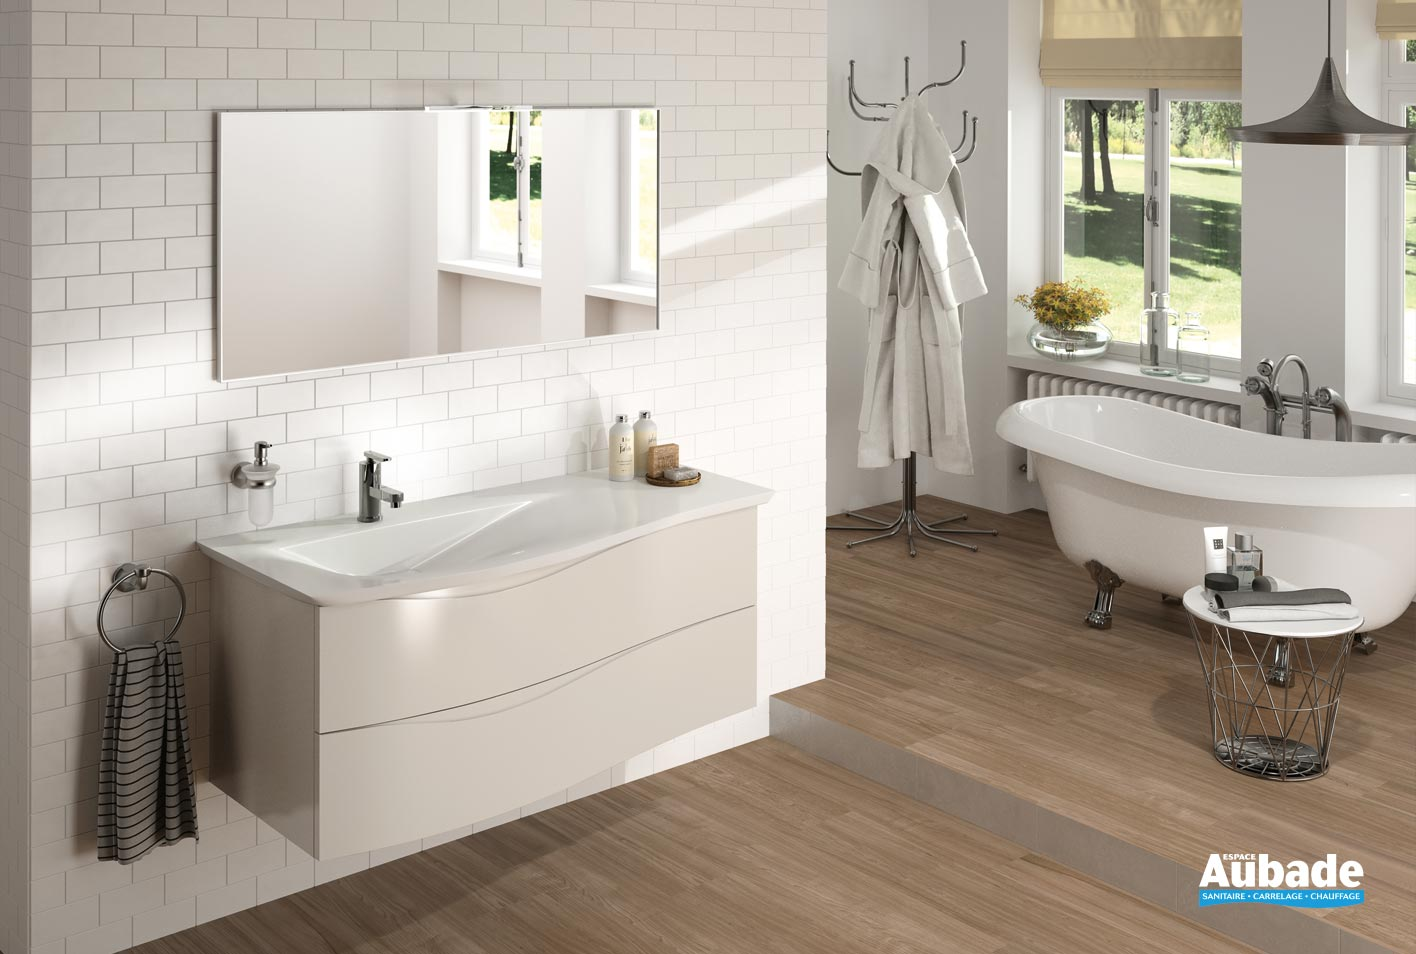 Meubles salle de bains twist cedam espace aubade - Aubade carrelage salle de bain ...